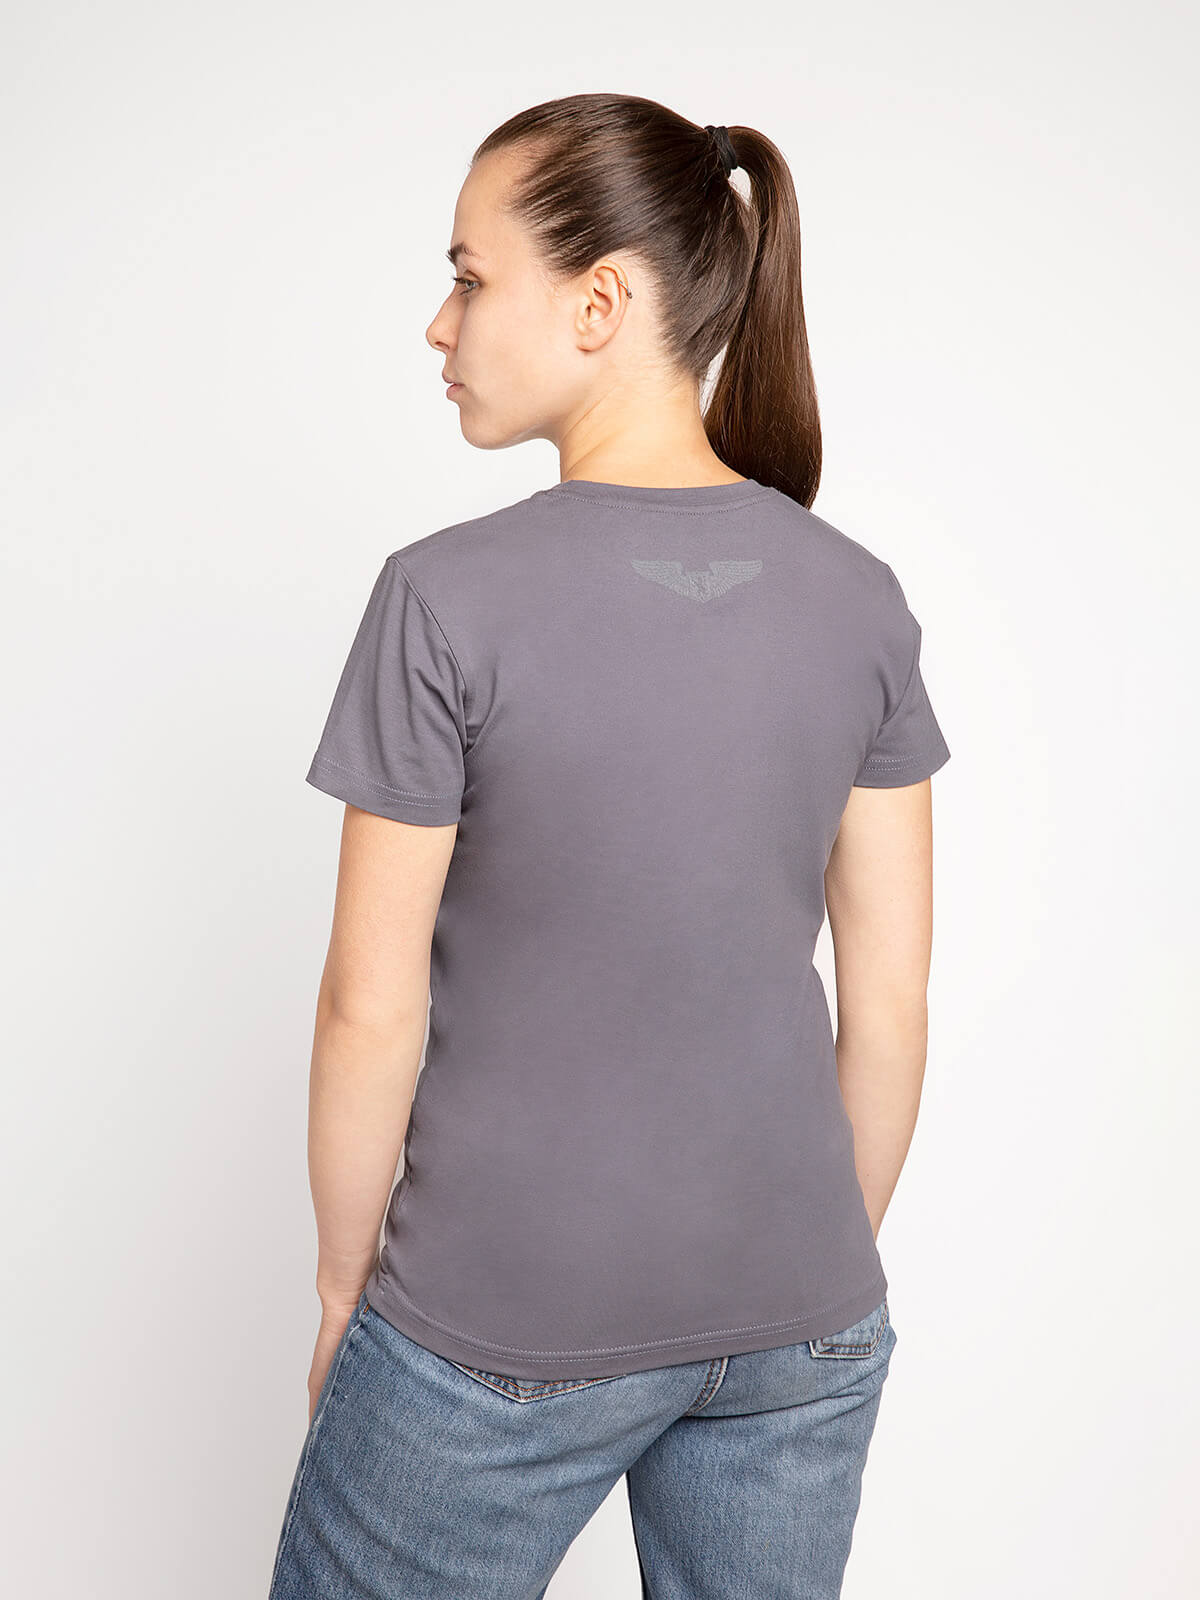 Women's T-Shirt Ukrainian Navy. Color gray.  Technique of prints applied: silkscreen printing.